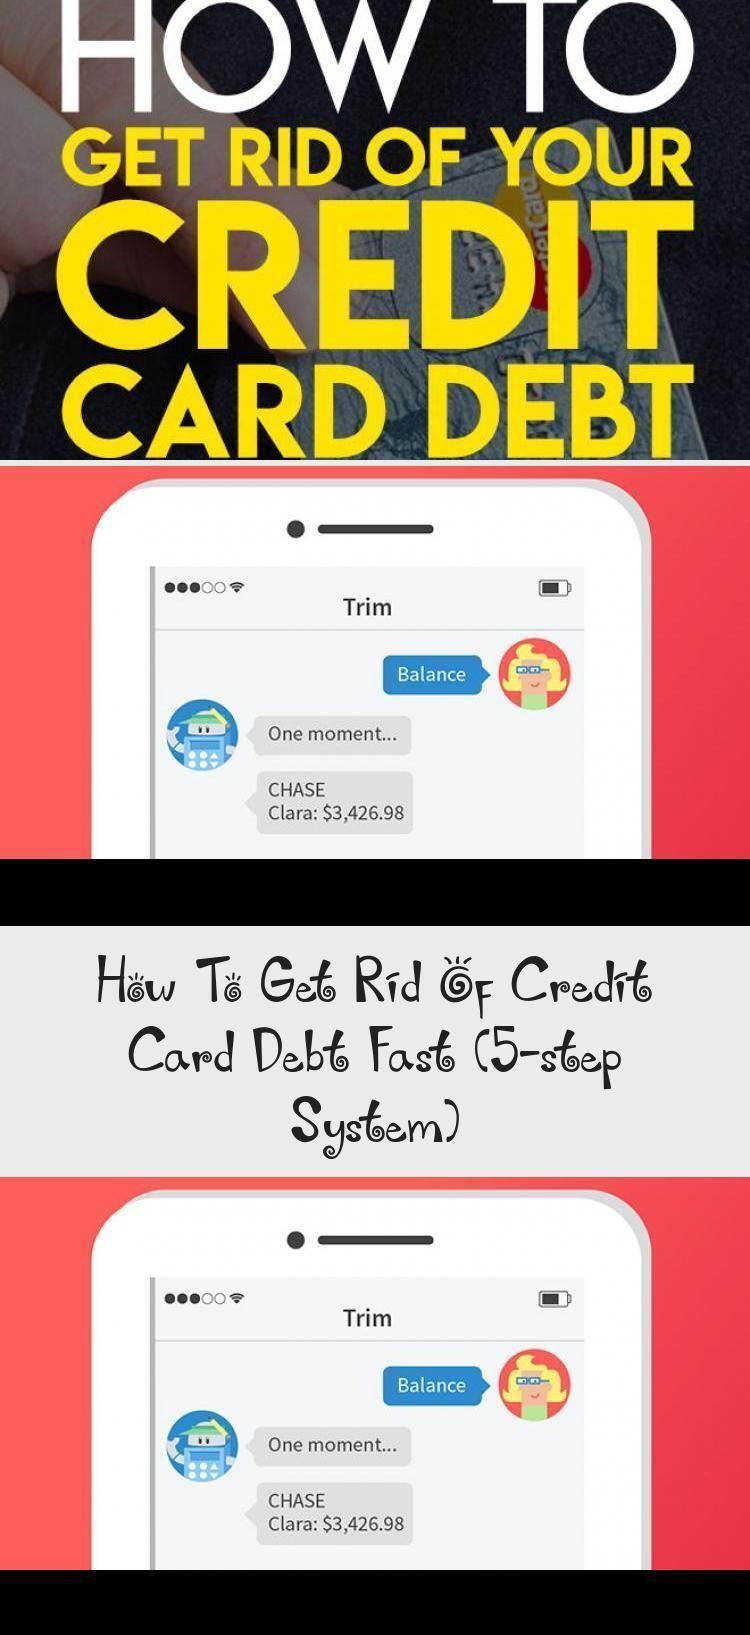 Creditcard Costume Credit Card Transfer Credit Card Reduce Credit Card Debt